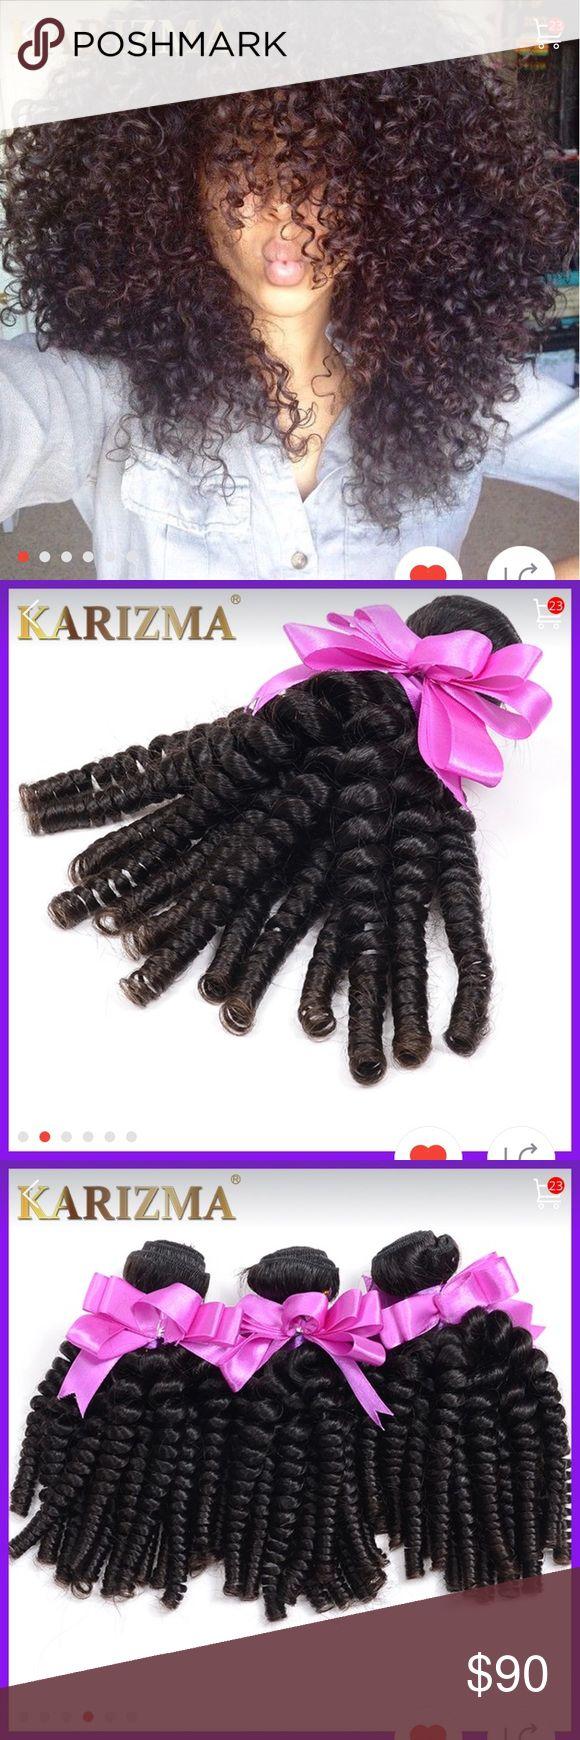 Brazilian Kinky Curly Virgin Hair 3 Bundles Afro Brazilian Kinky Curly Virgin…